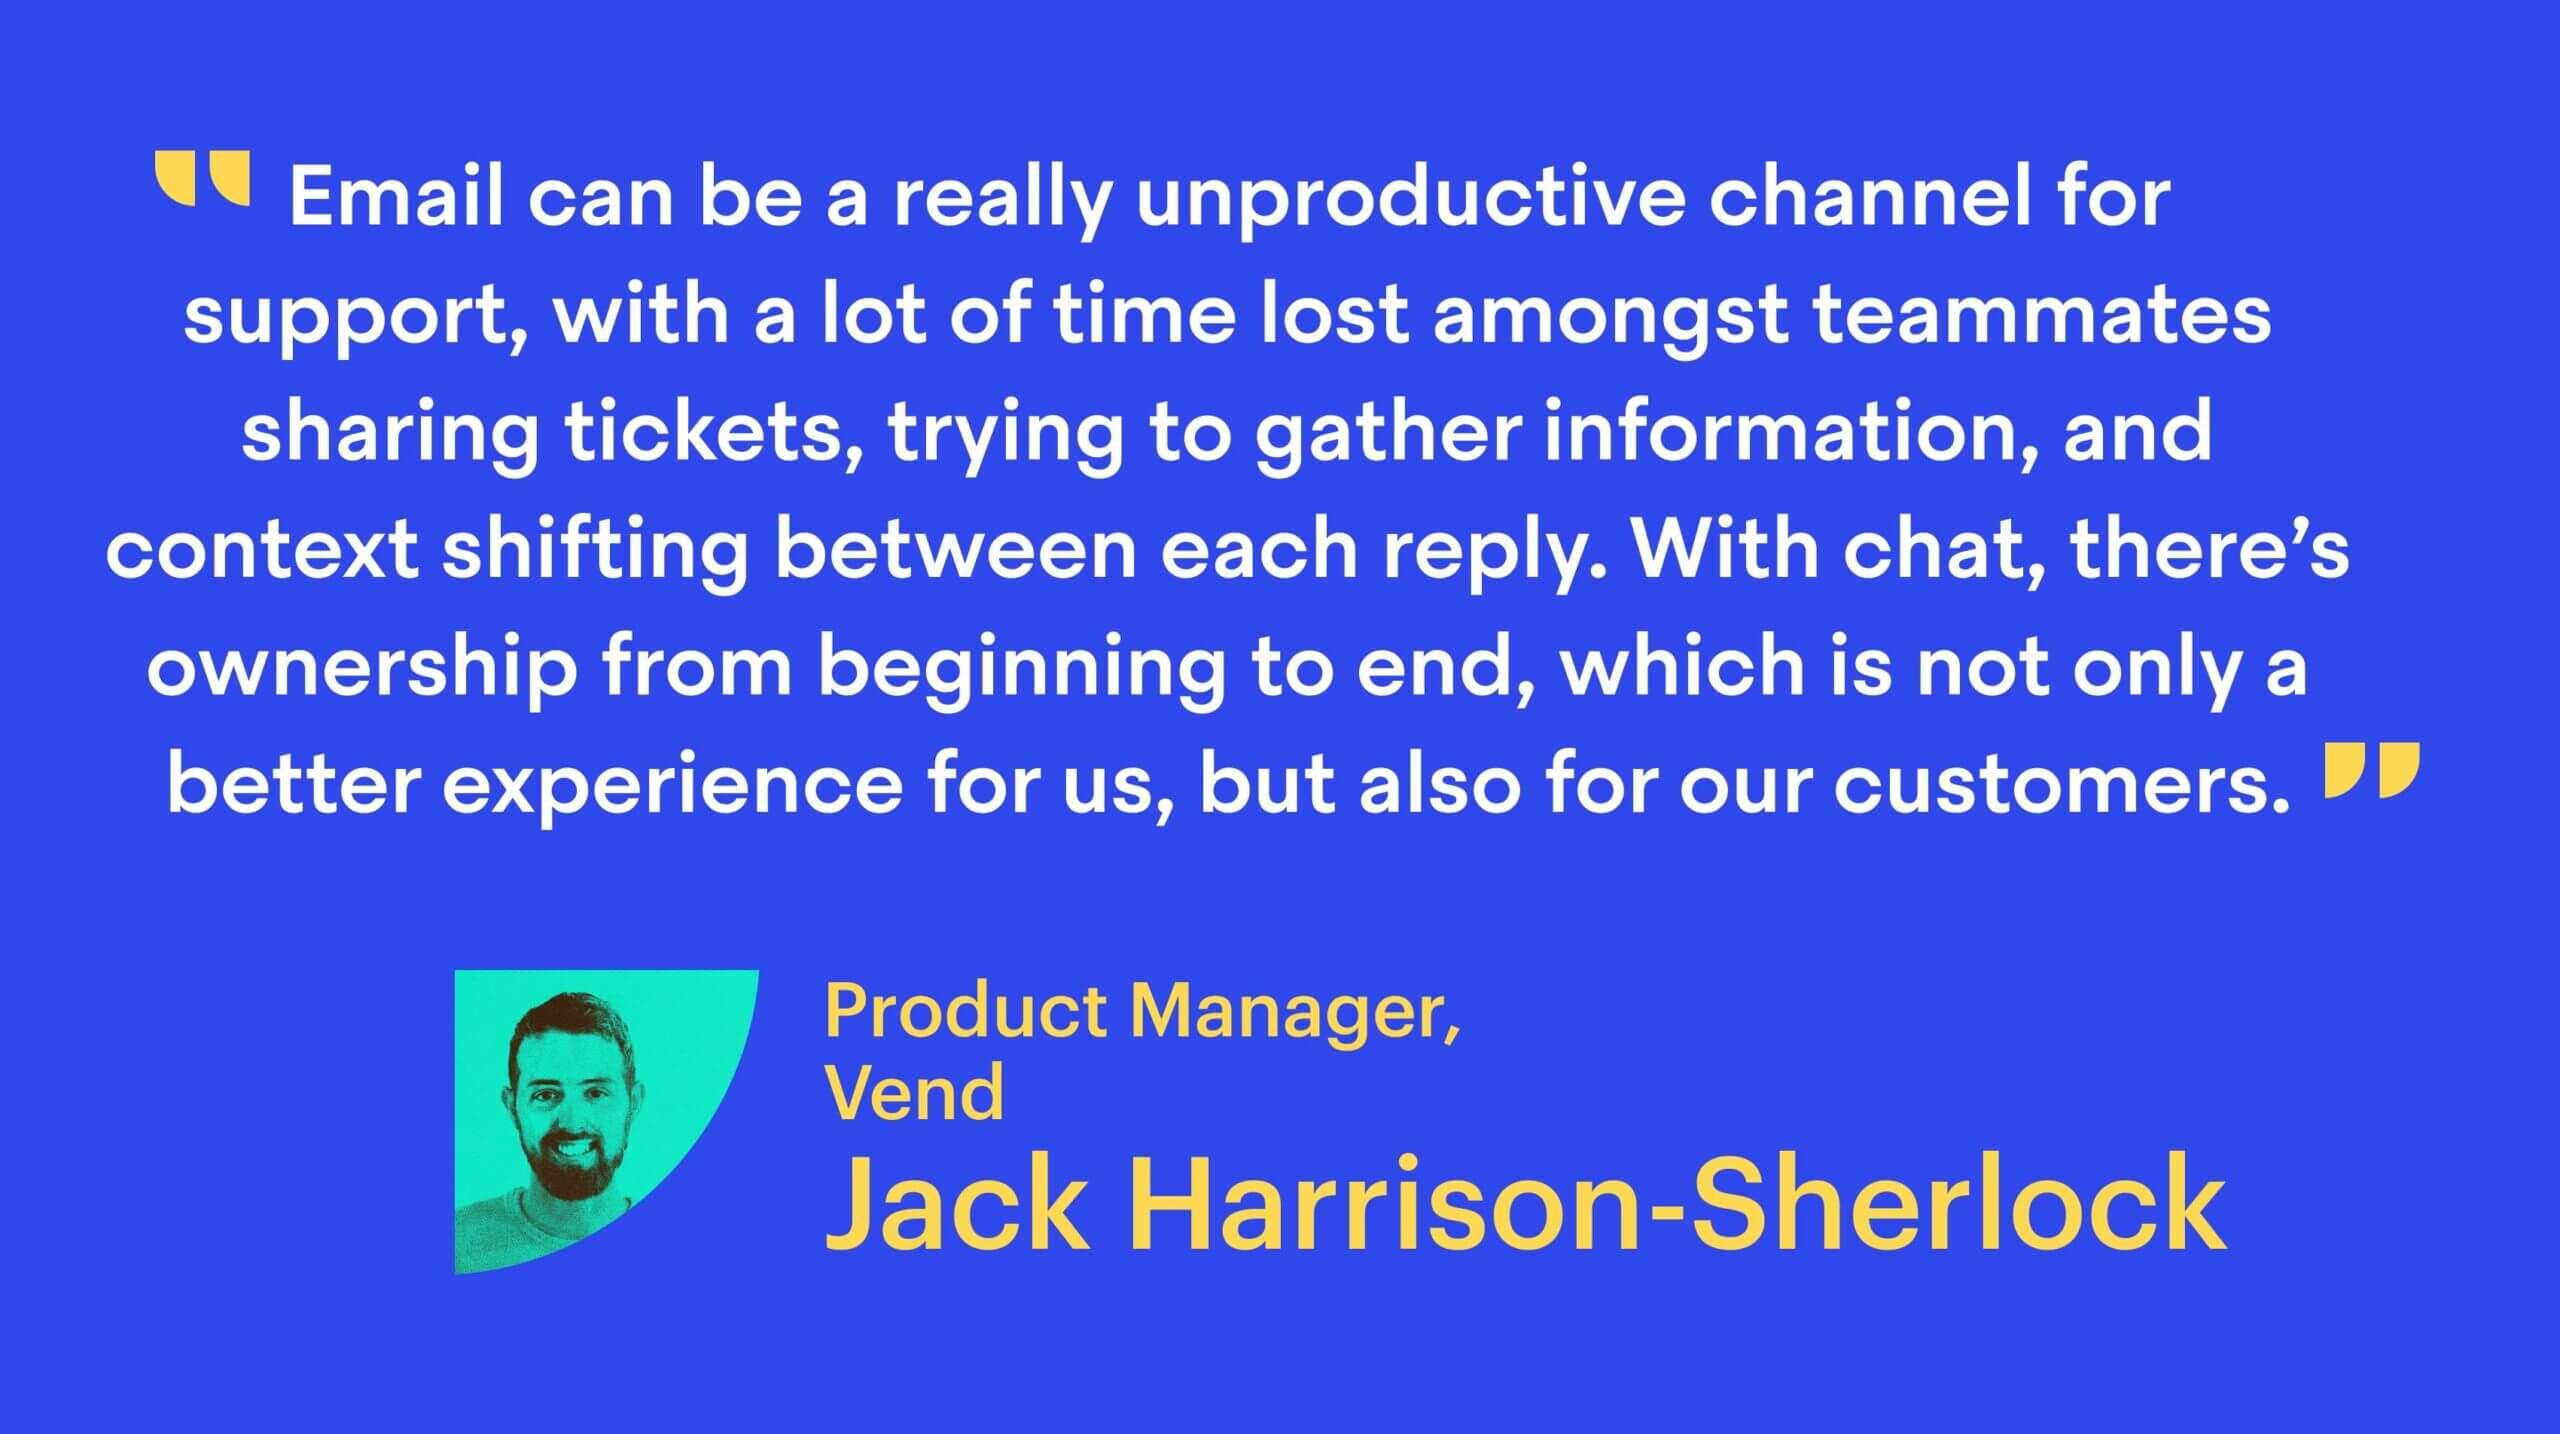 Jack Harrison-Sherlock, Product Manager at Vend